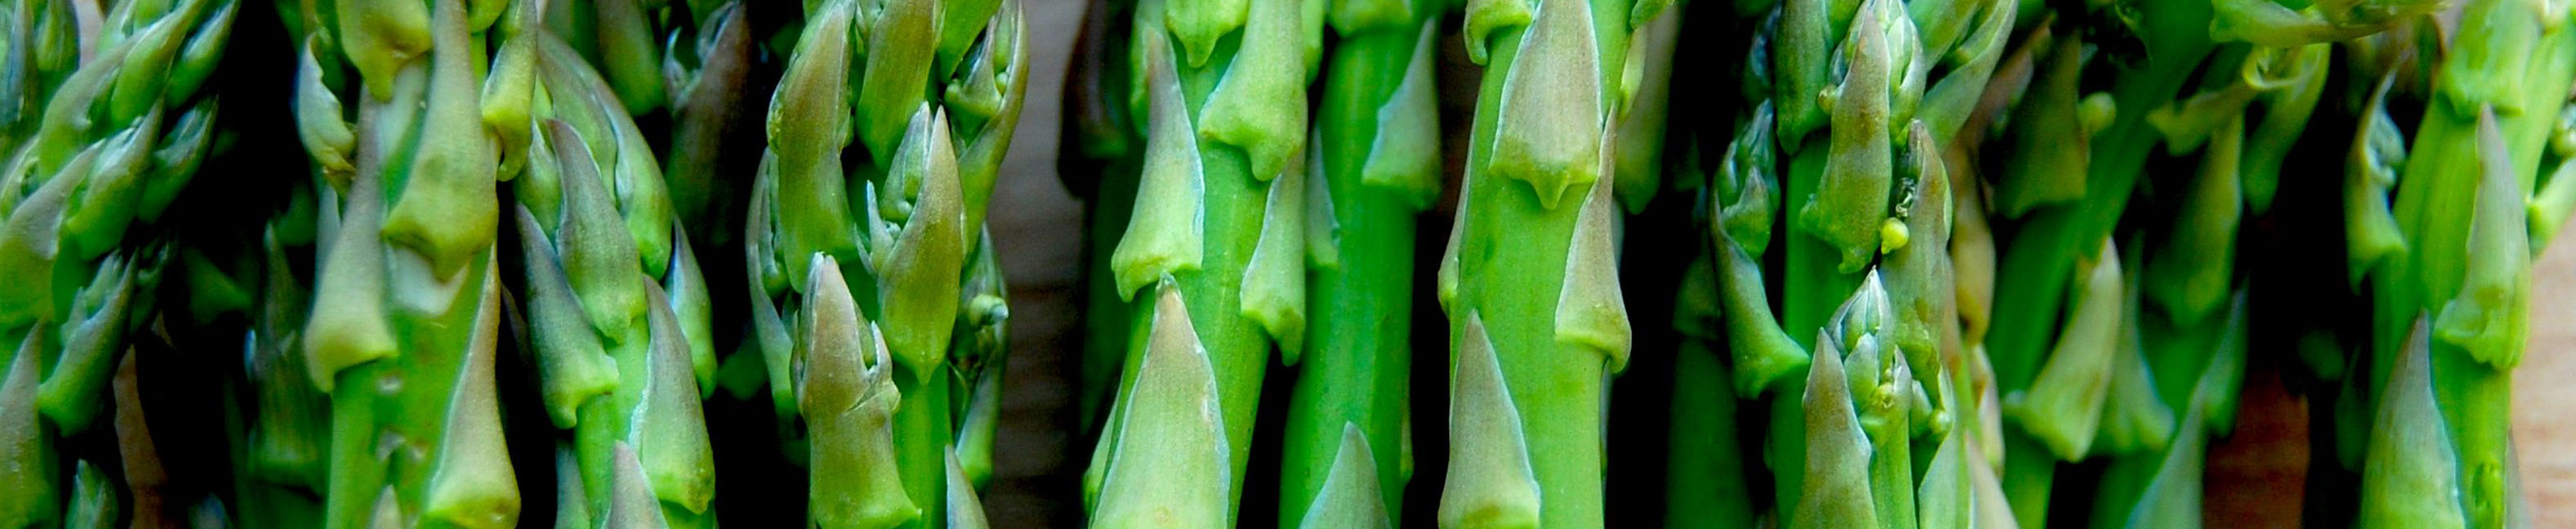 328-1_0002_Health-Benefits-Of-Asparagus